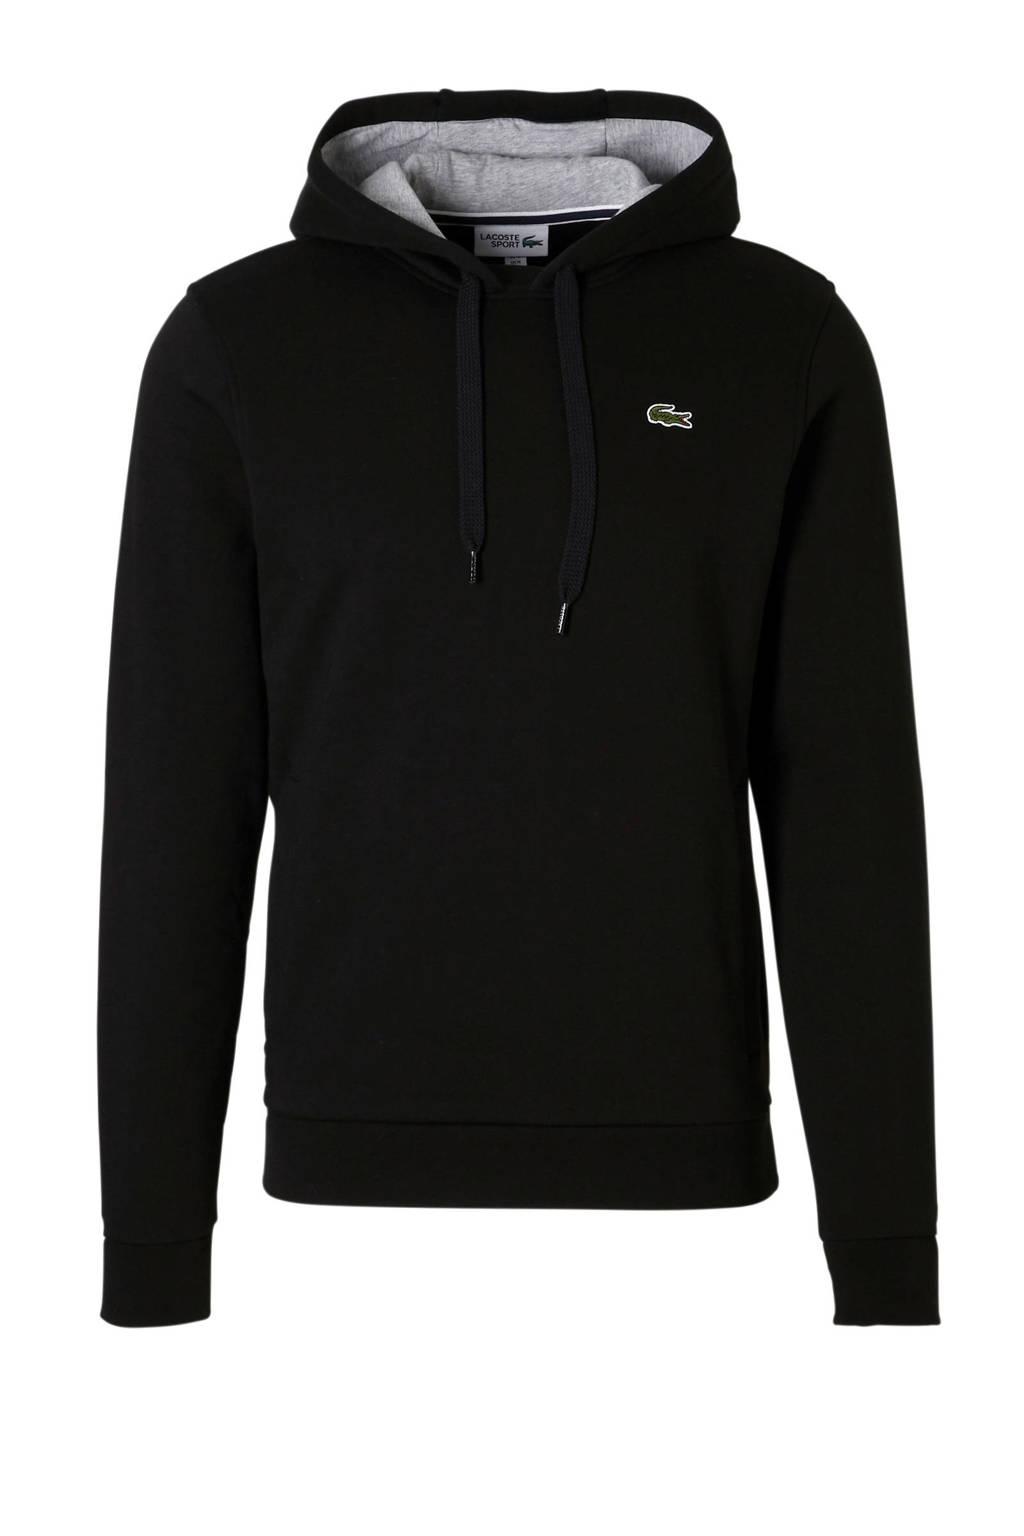 Lacoste   sportsweater zwart, Zwart